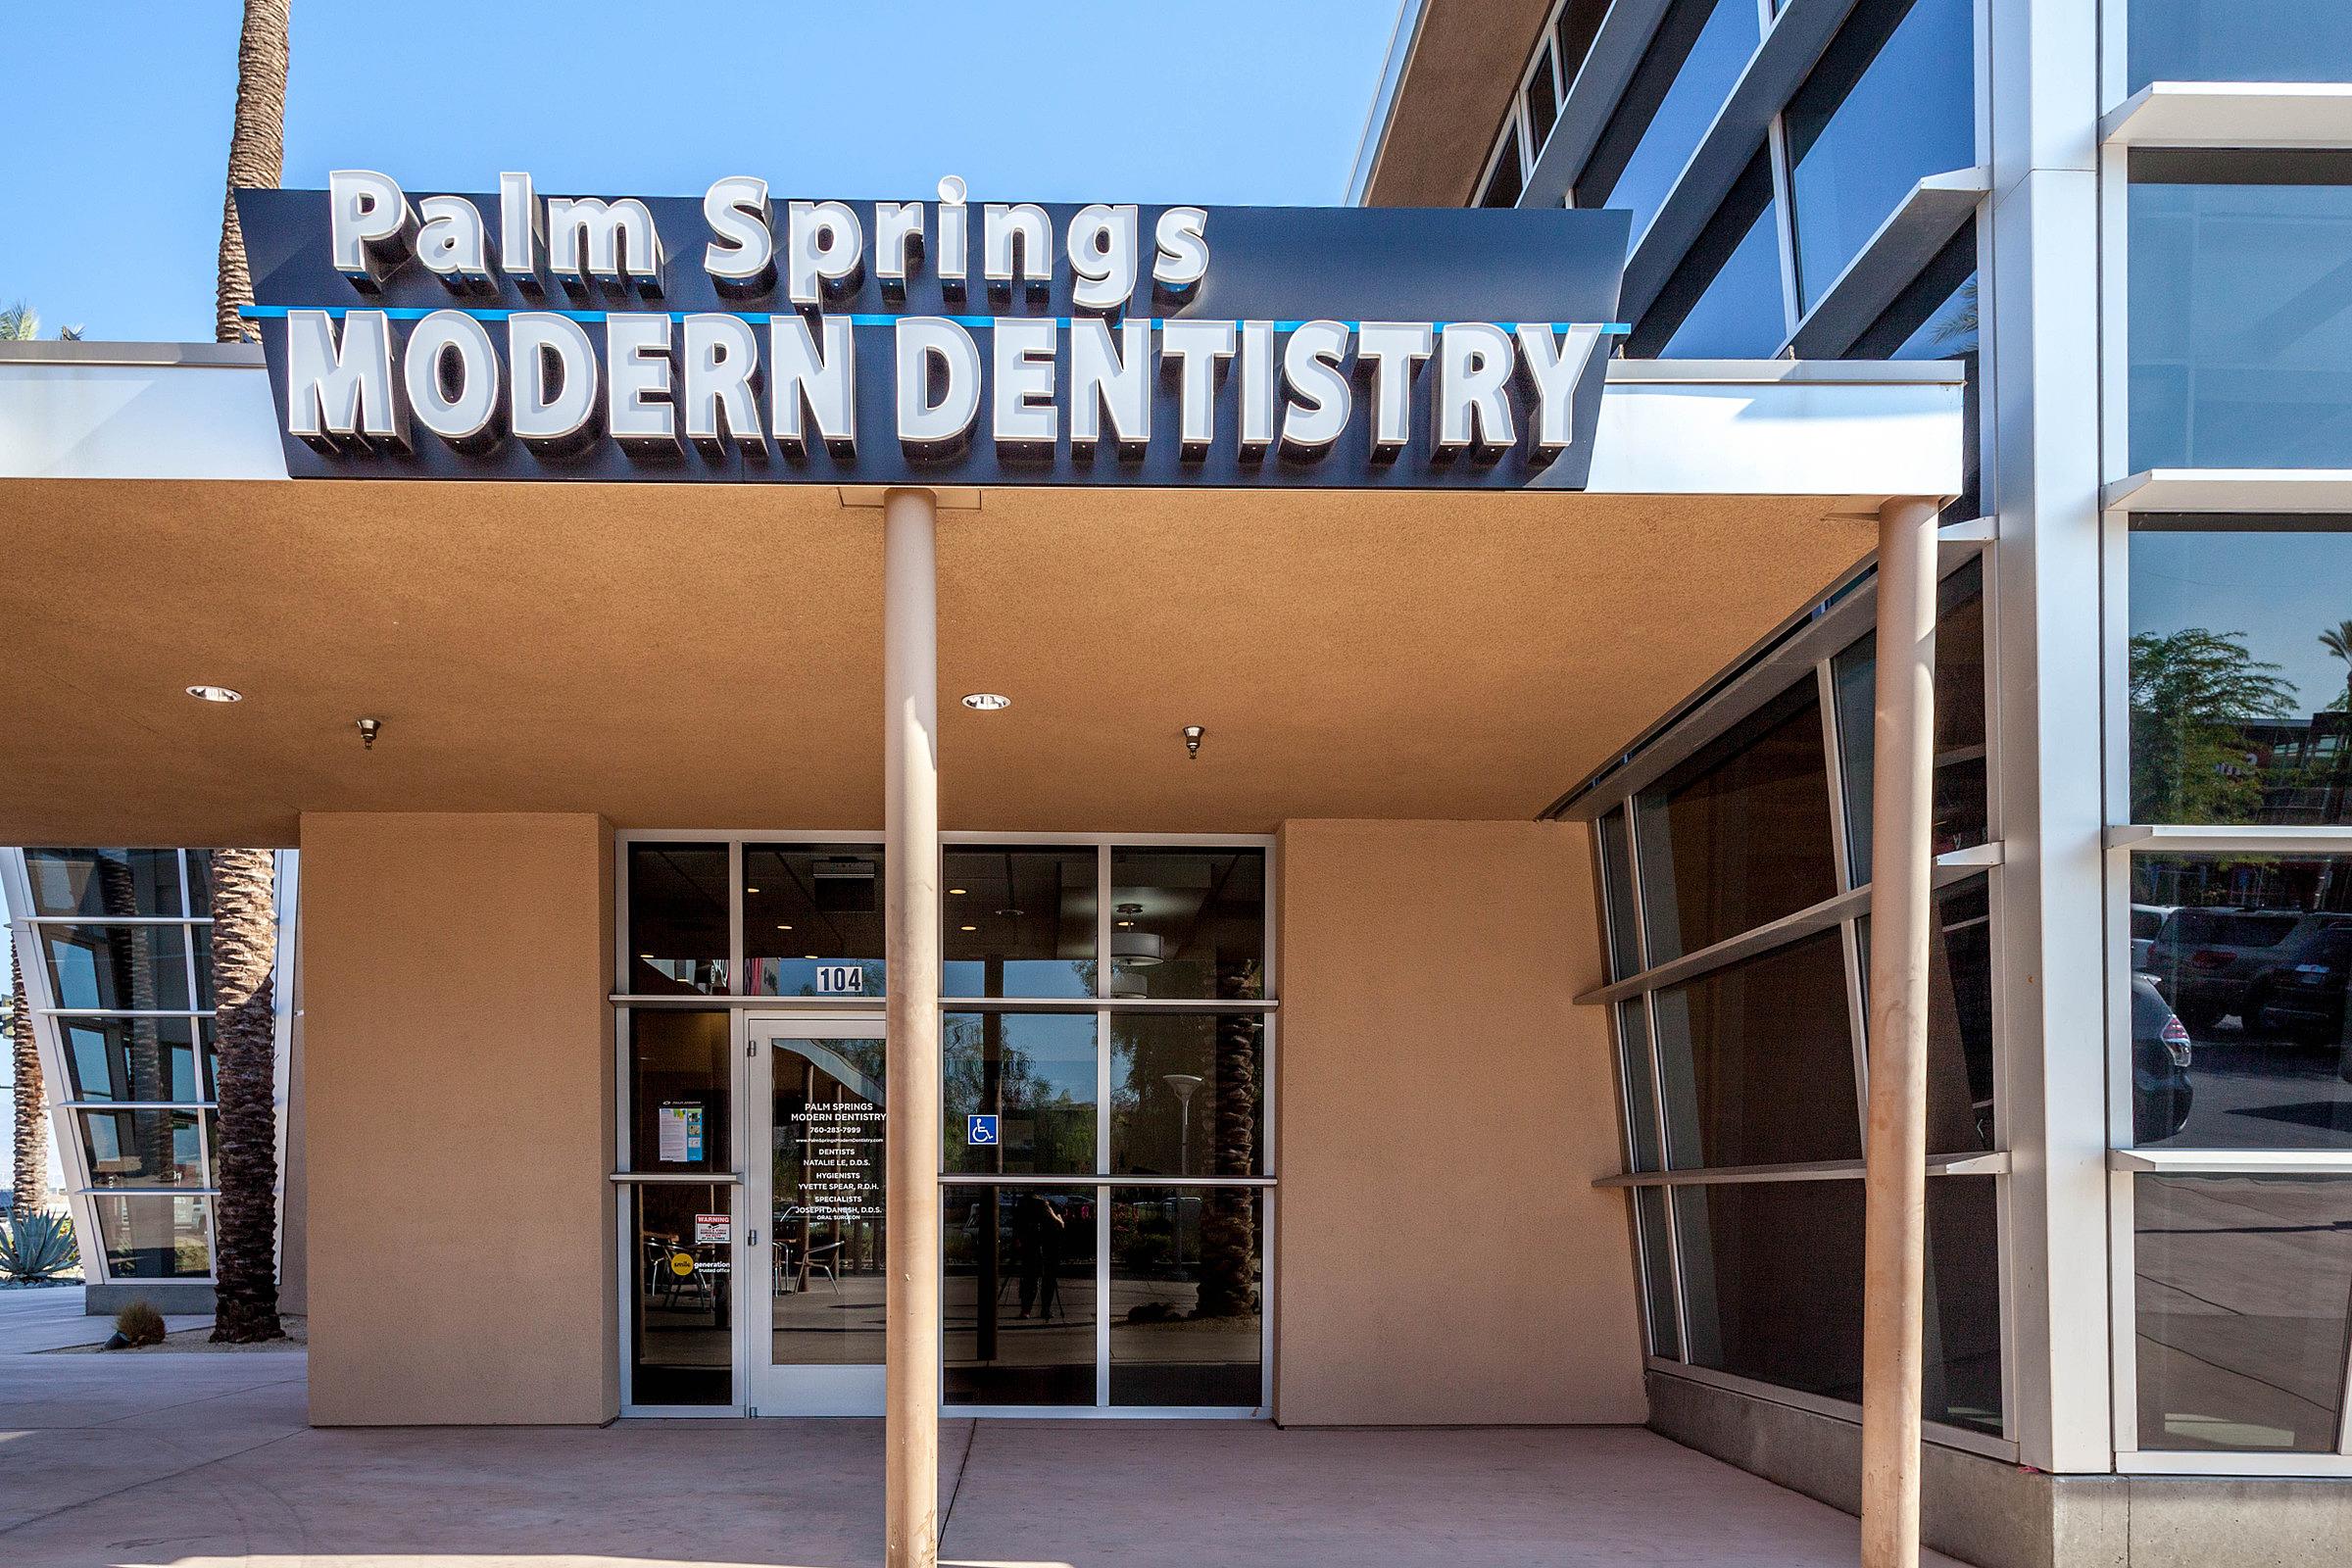 Palm Springs Modern Dentistry In Palm Springs, Ca  (760